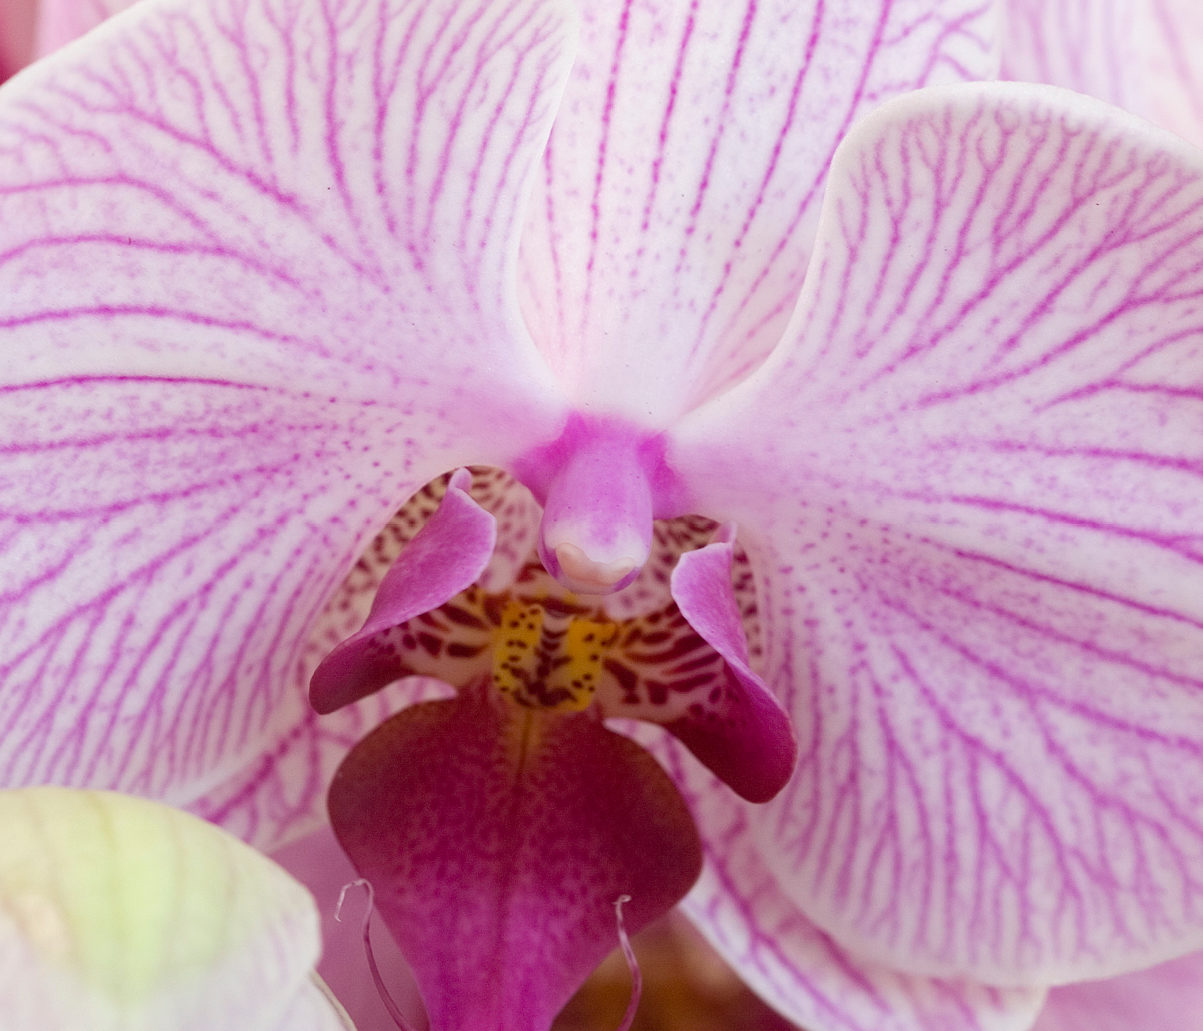 Meet the most popular houseplant: the Phalaenopsis